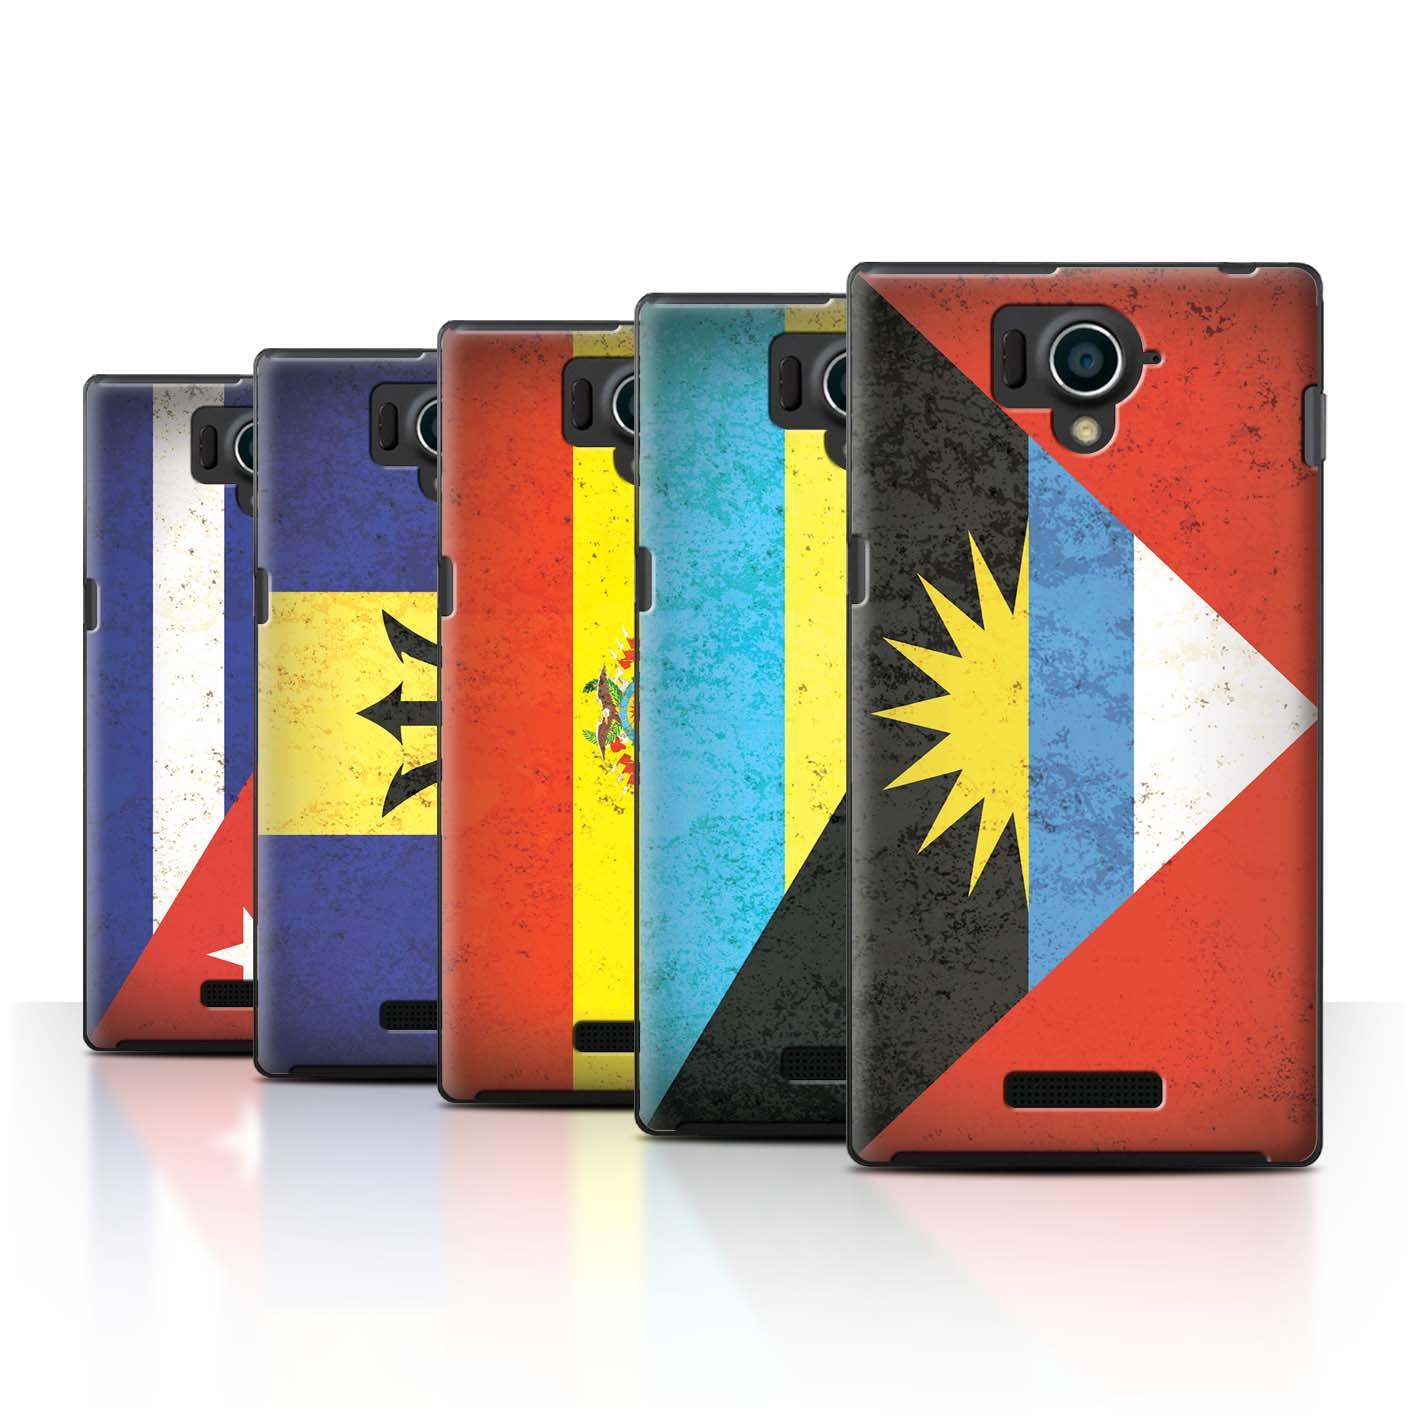 STUFF4-Back-Case-Cover-Skin-for-Sharp-Aquos-Xx-304SH-Americas-Flag